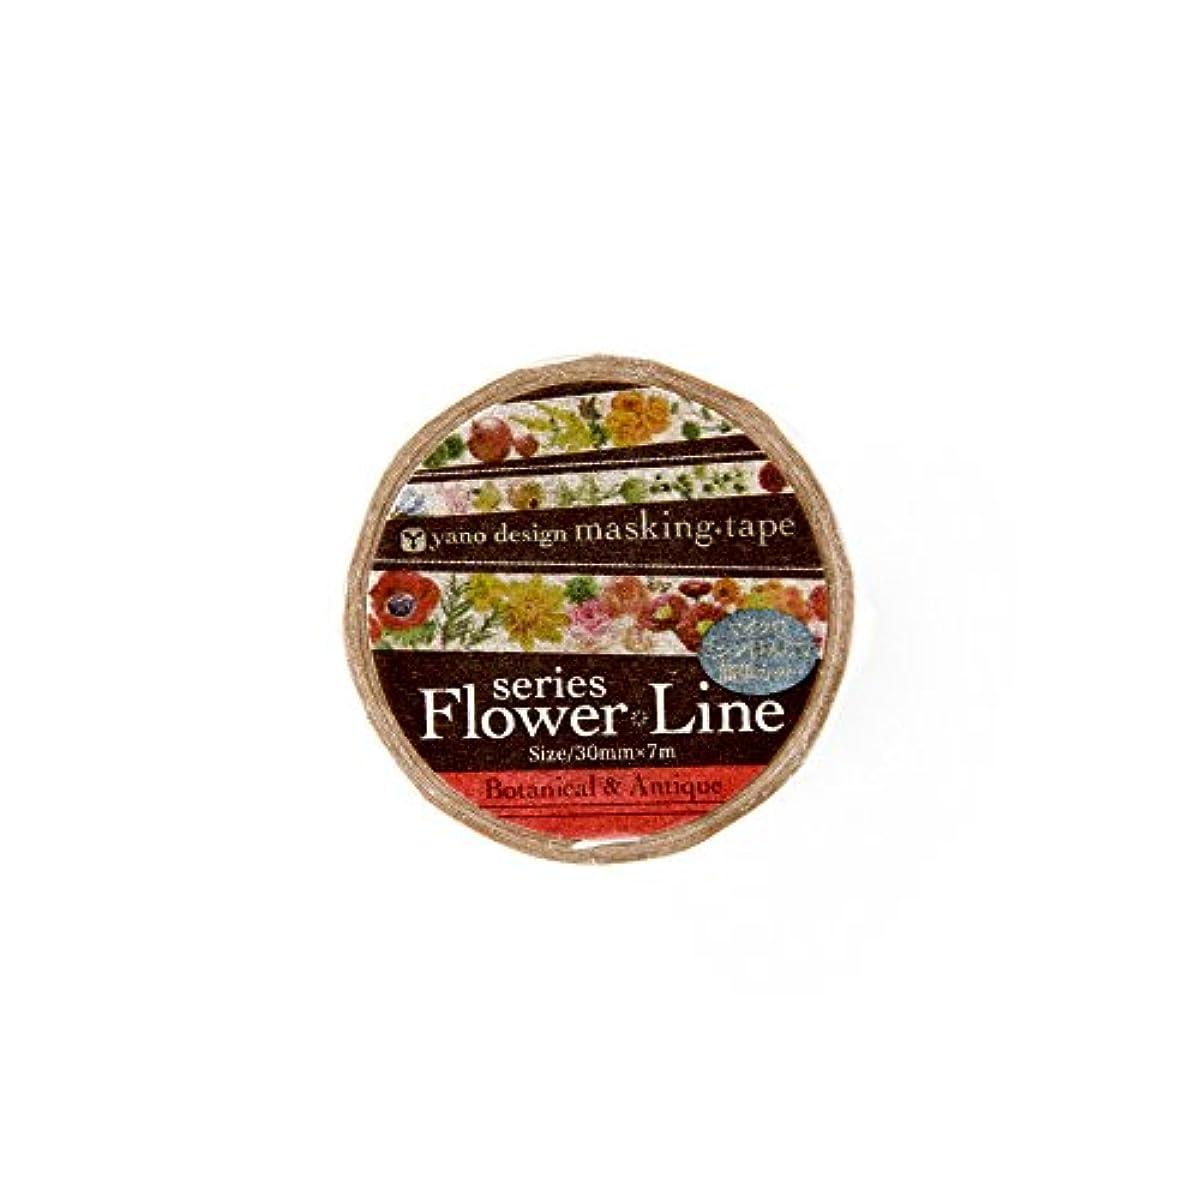 Roundtop Designer's Washi Masking Tape, Yano Design Series Flower Line, Botanical & Antique (YD-MK-068)